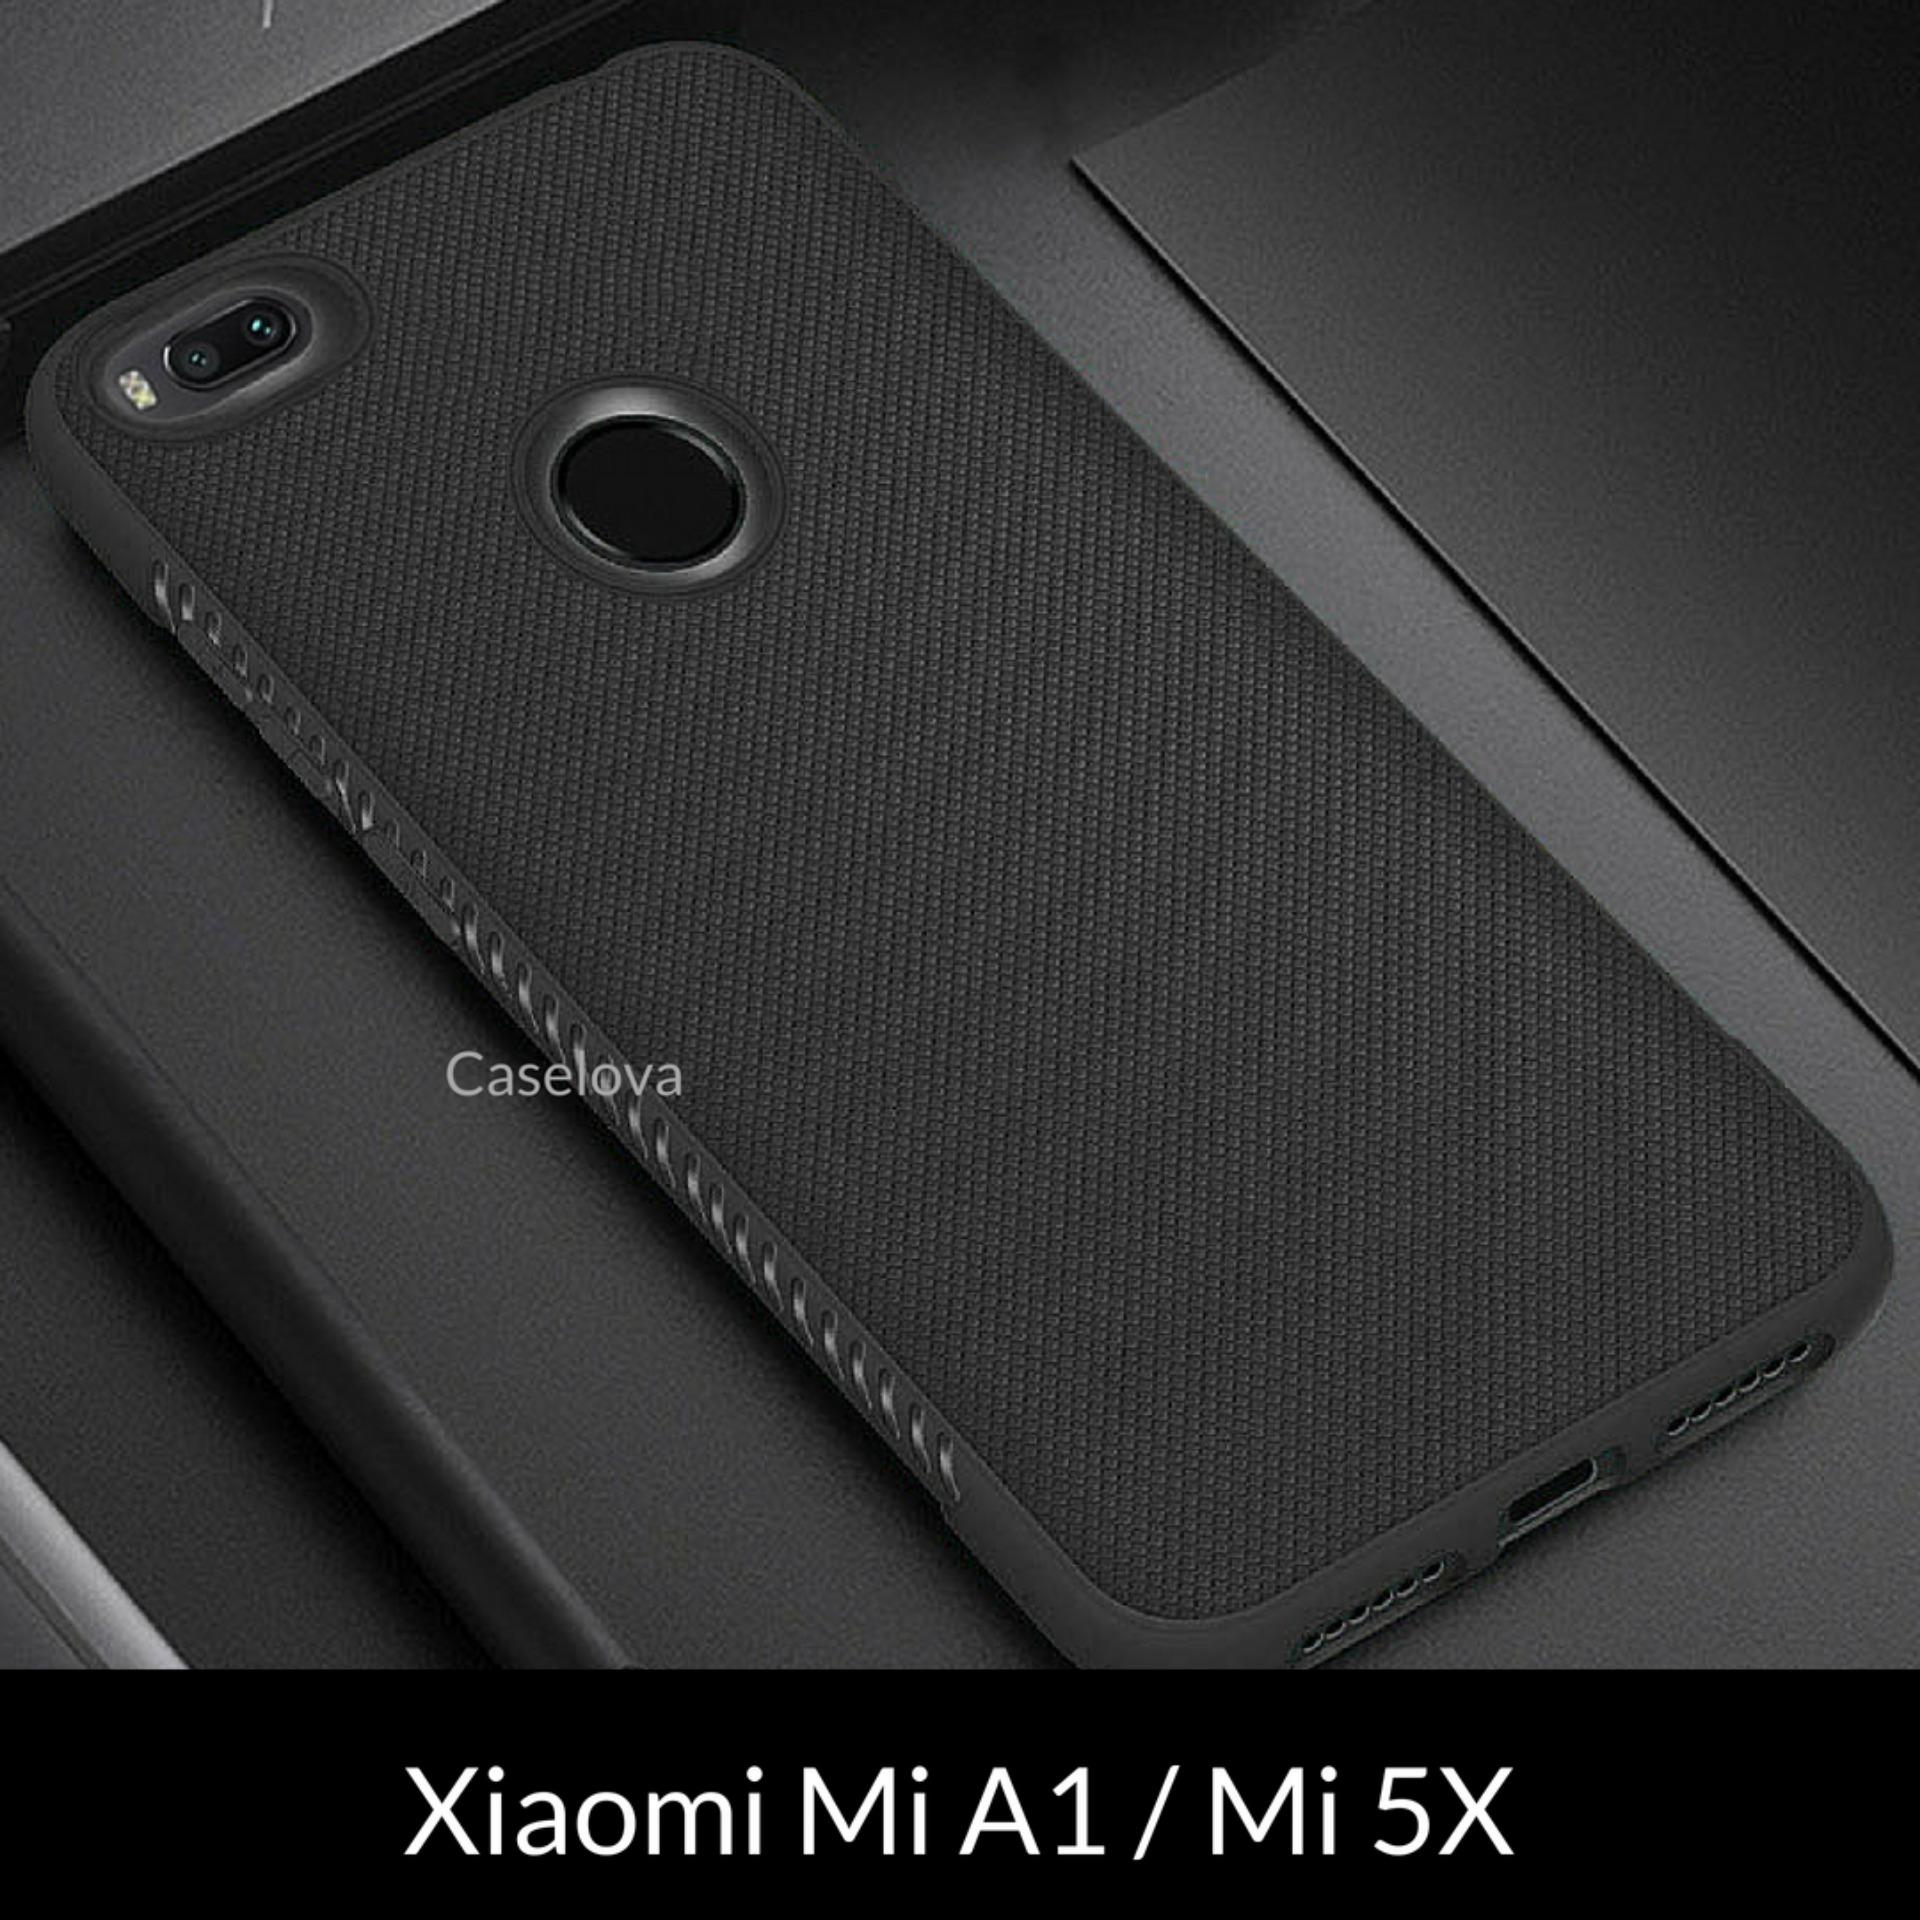 Caselova Luxury Shatterproof Protection TPU Anti Slip Case For Xiaomi Mi A1 / Mi 5X Layar 5.5 inch